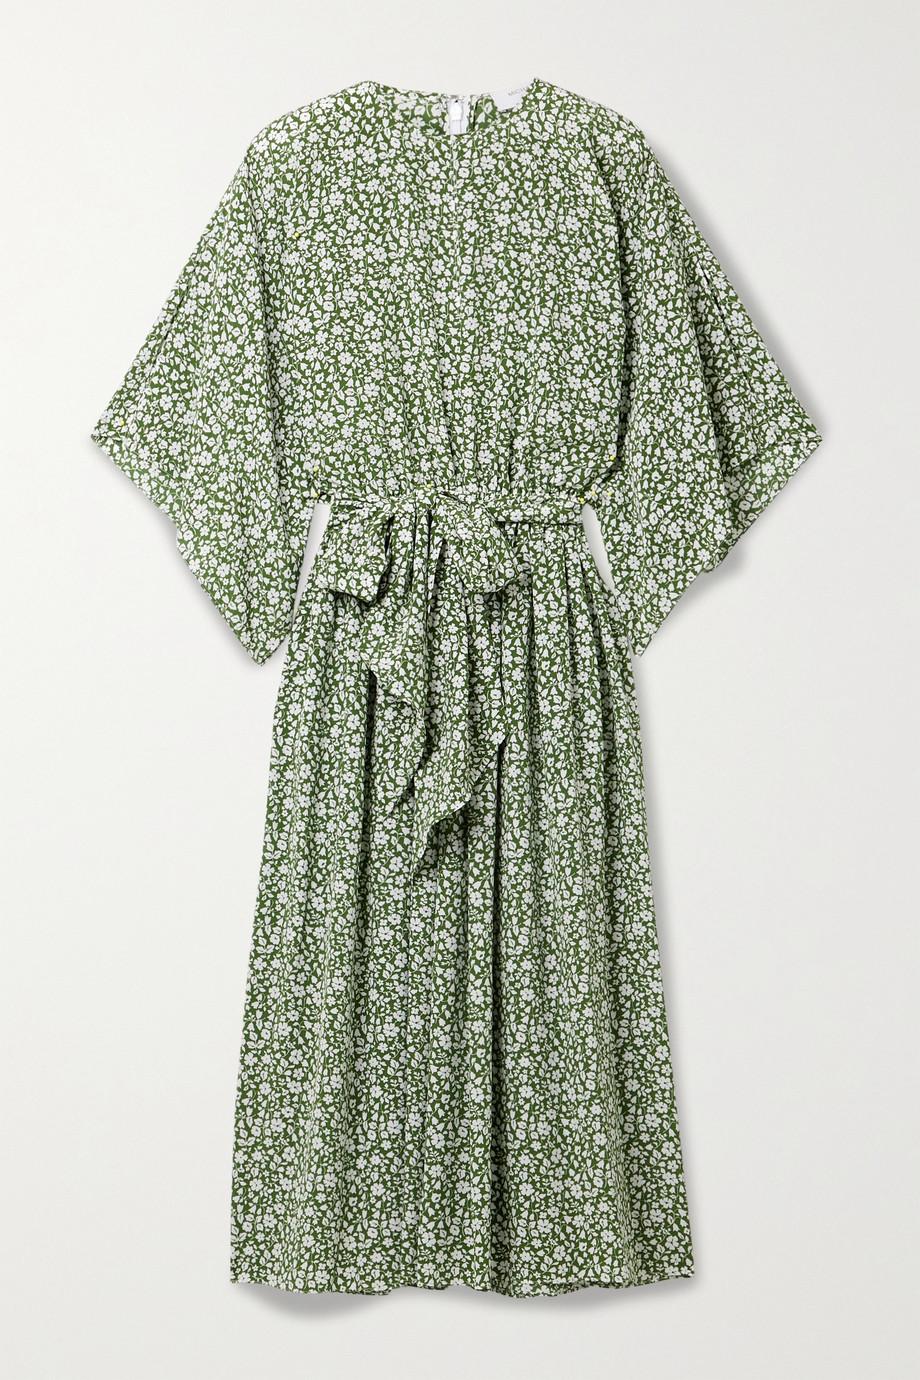 Michael Kors Collection Belted floral-print silk crepe de chine midi dress